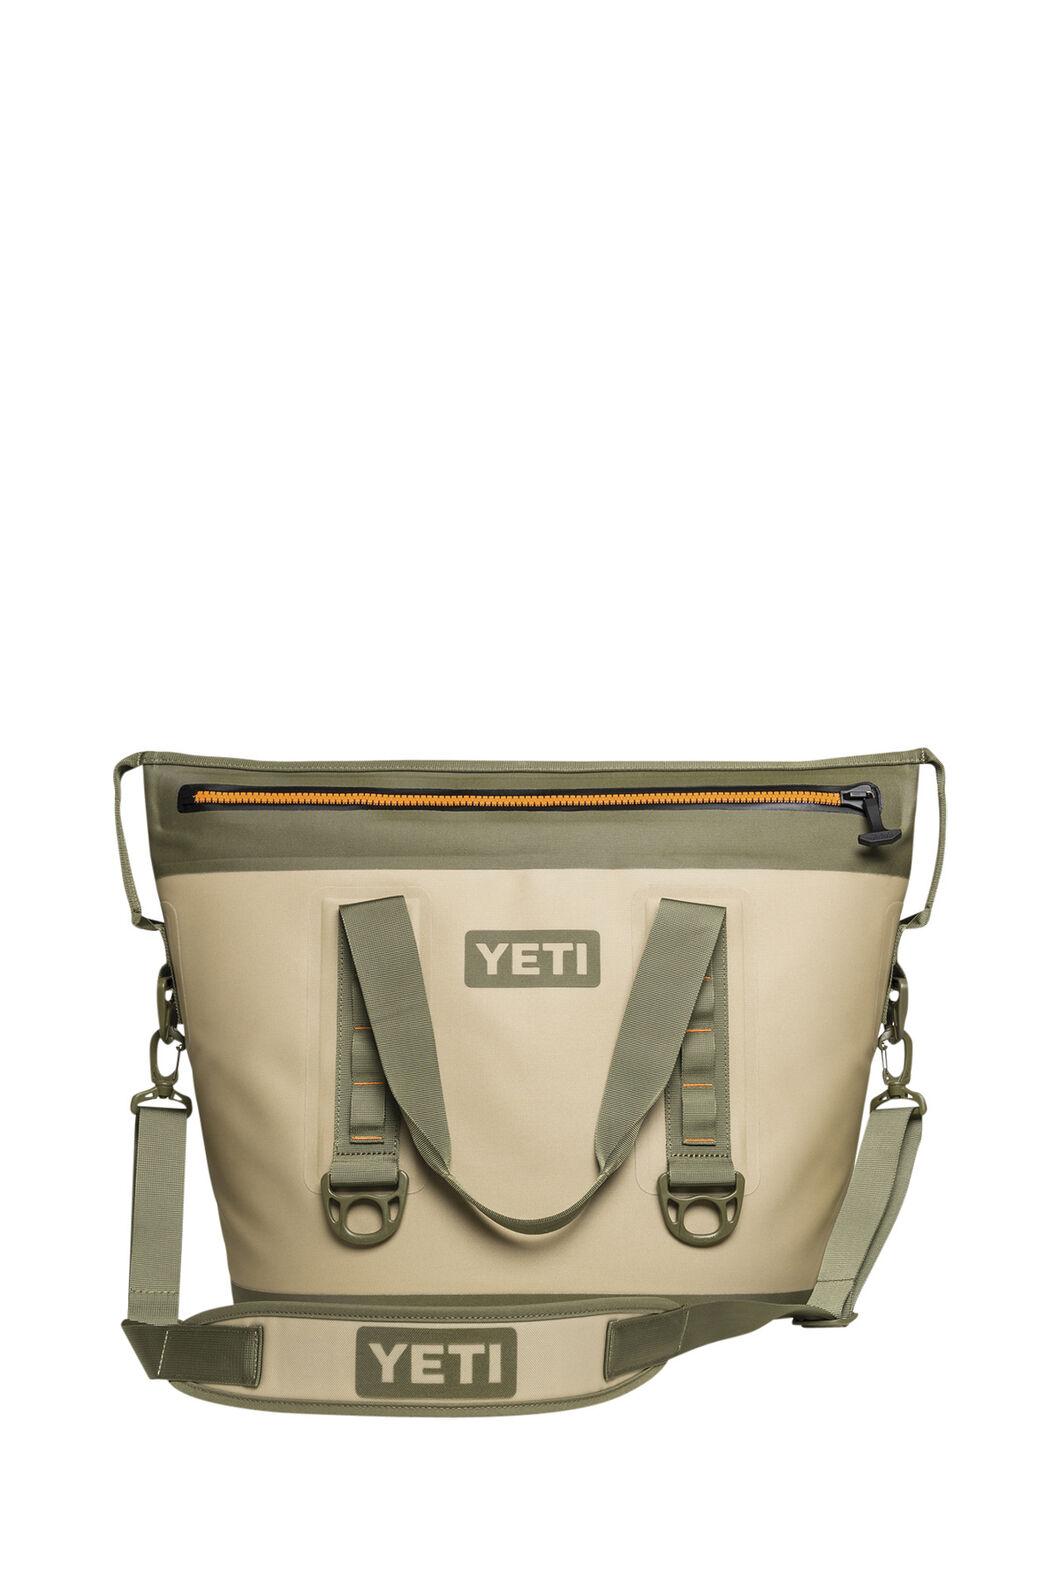 Yeti Hopper Two 30 Soft Cooler, Tan, hi-res